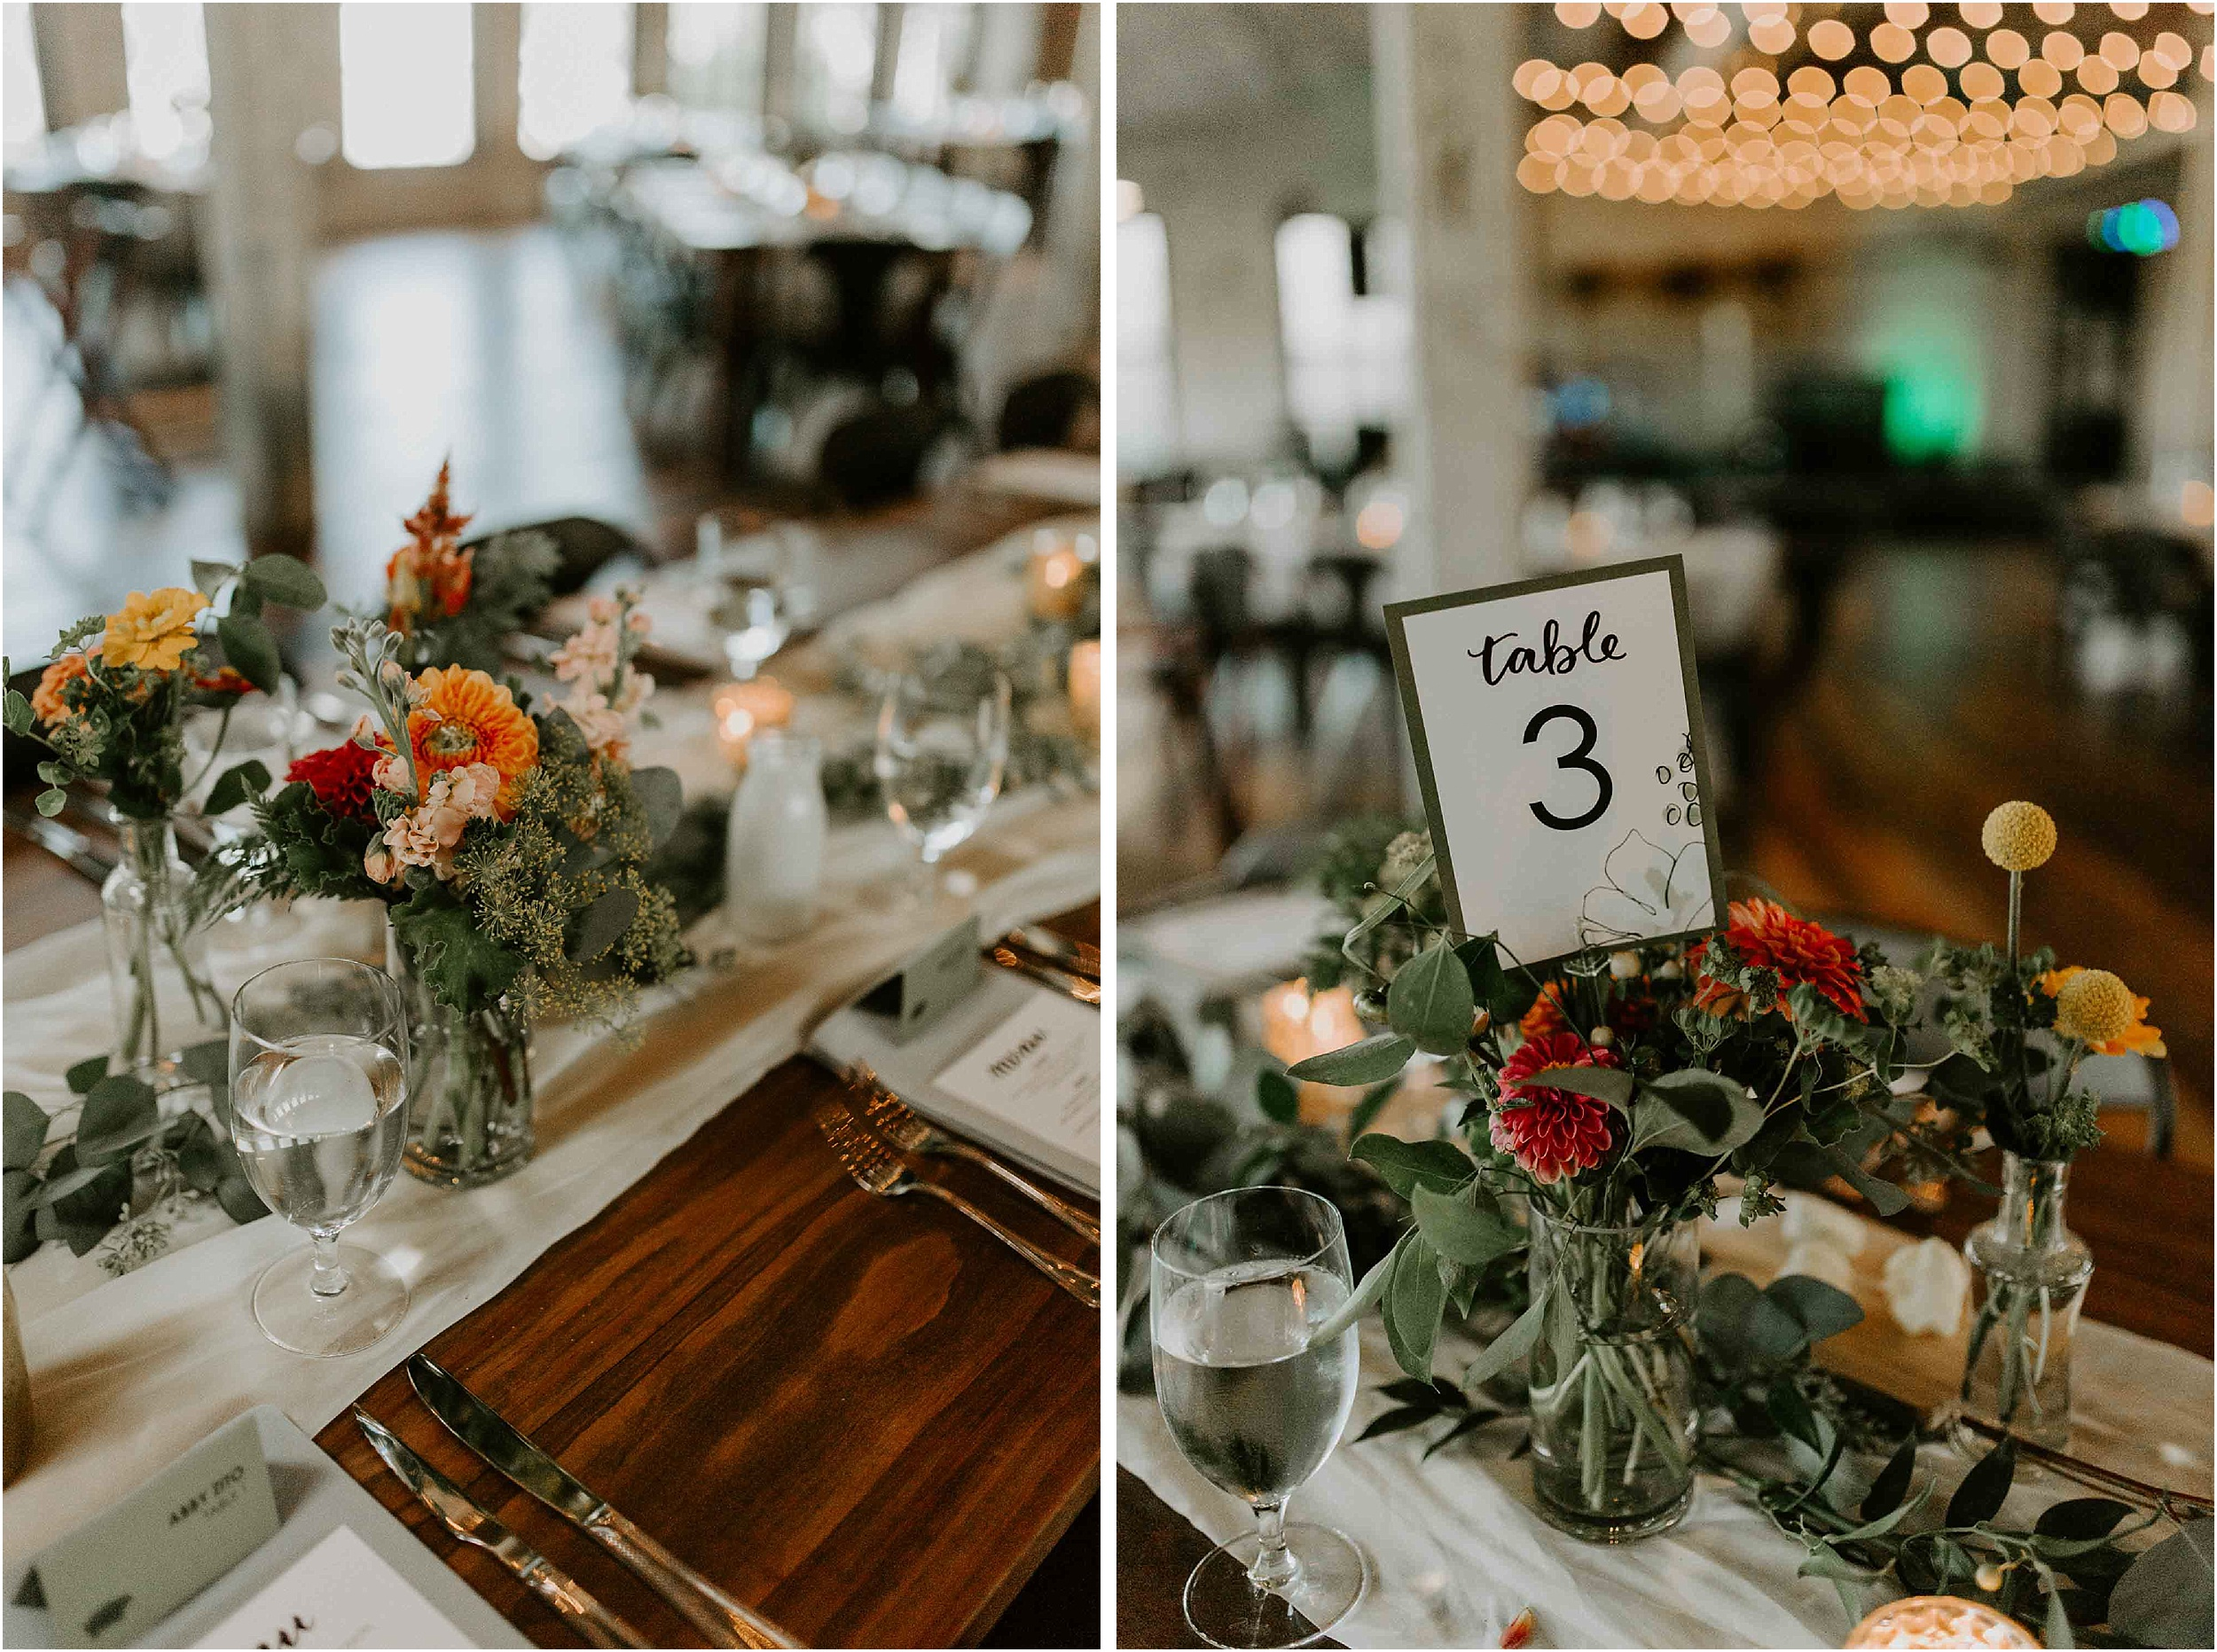 journeyman_distillery_wedding_photographer_chicago_il_wright_photographs-4101.jpg